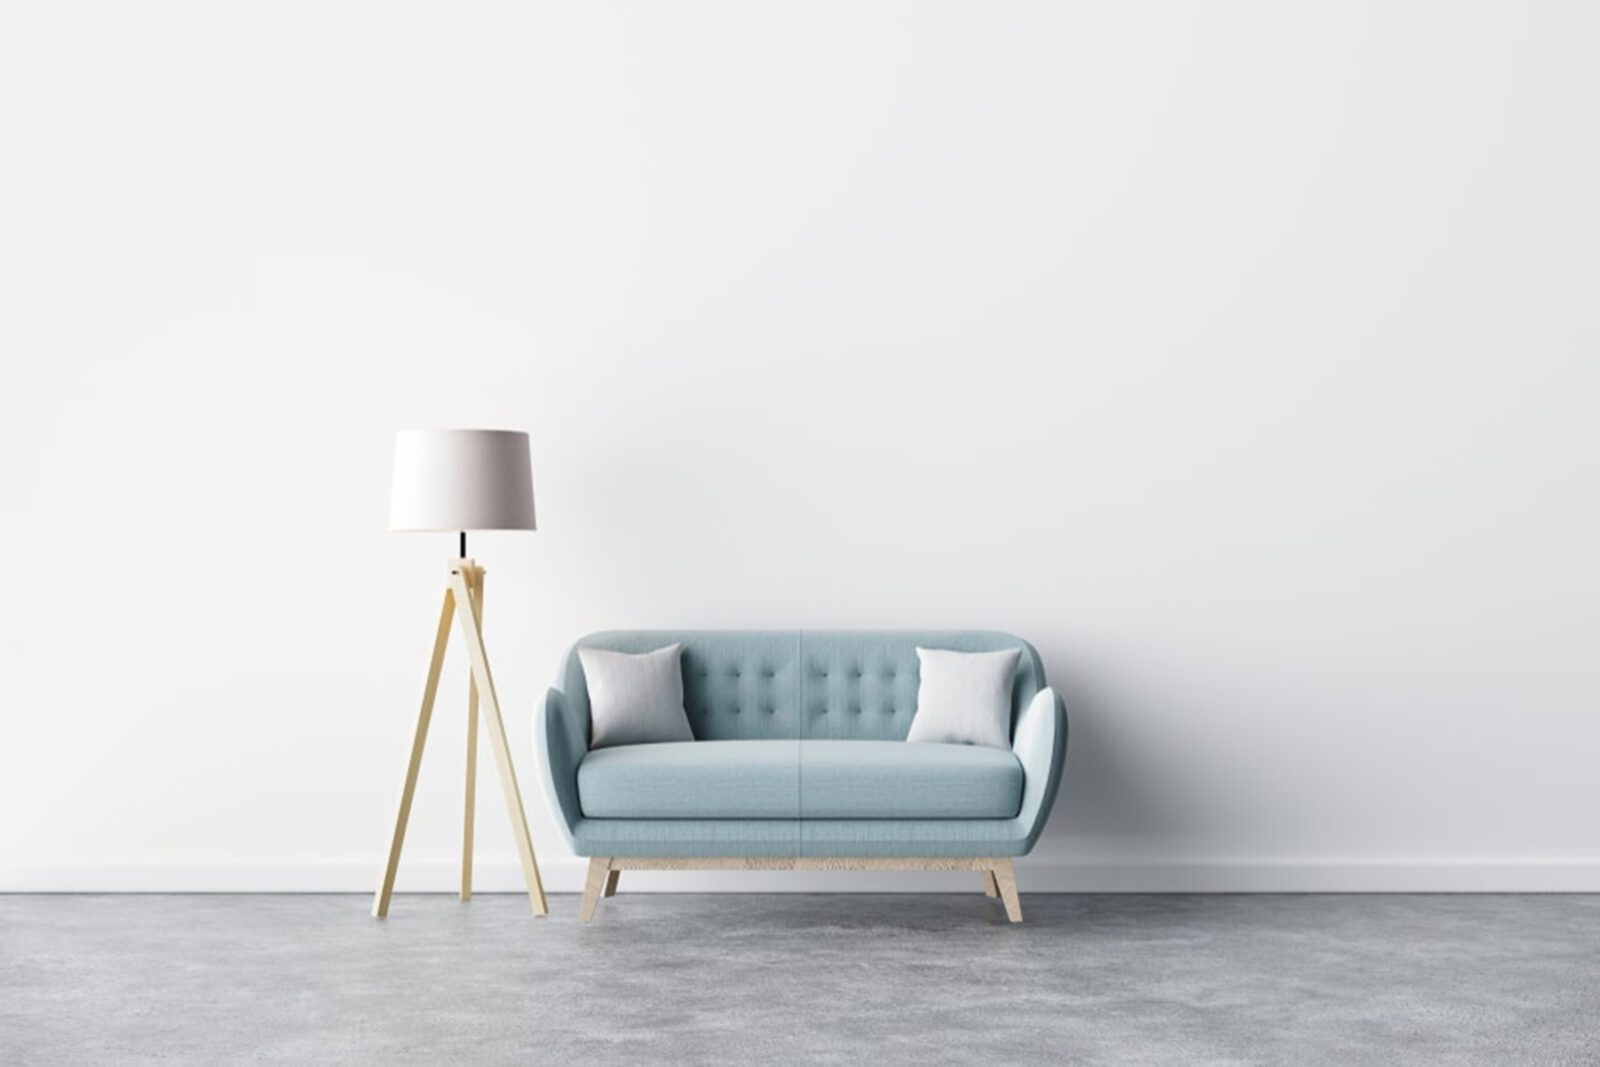 photo of sofa